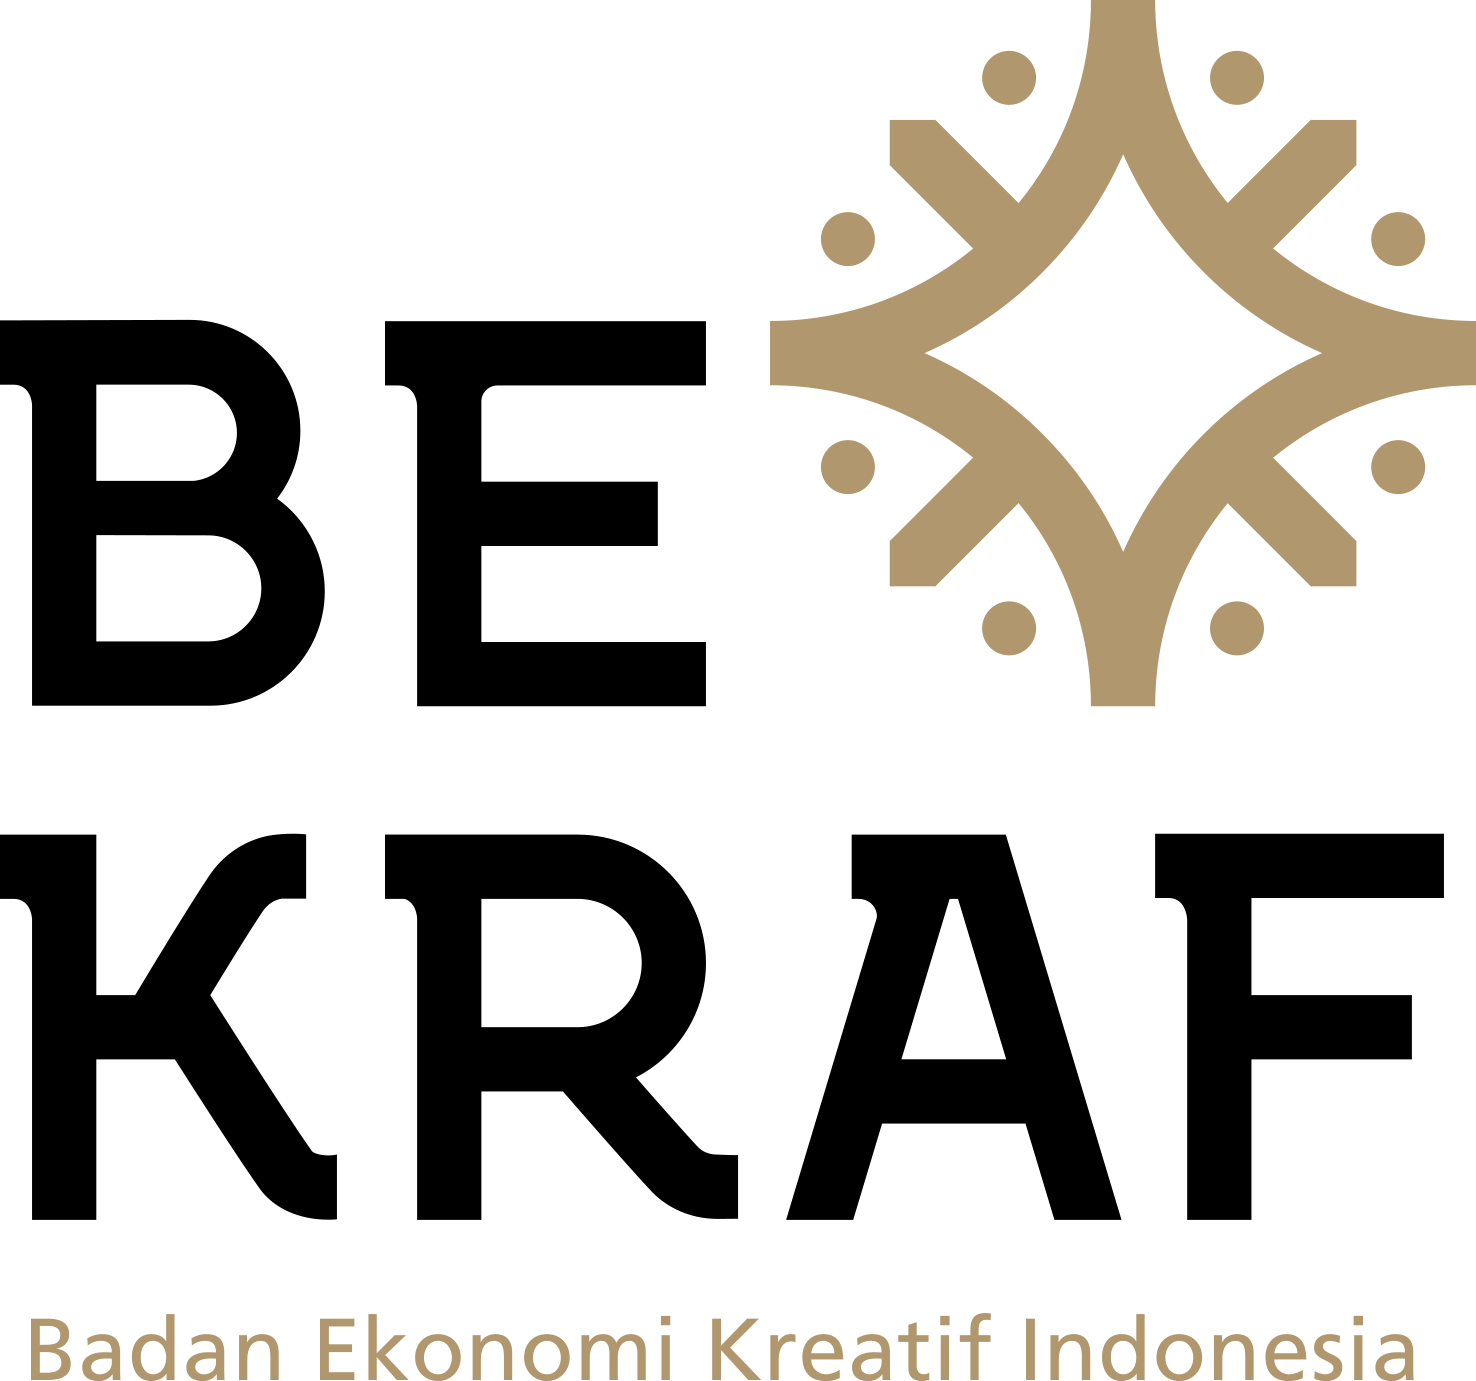 Masterclass 02 - IoT, Sensors, & Big Data | BDD Bogor 2017